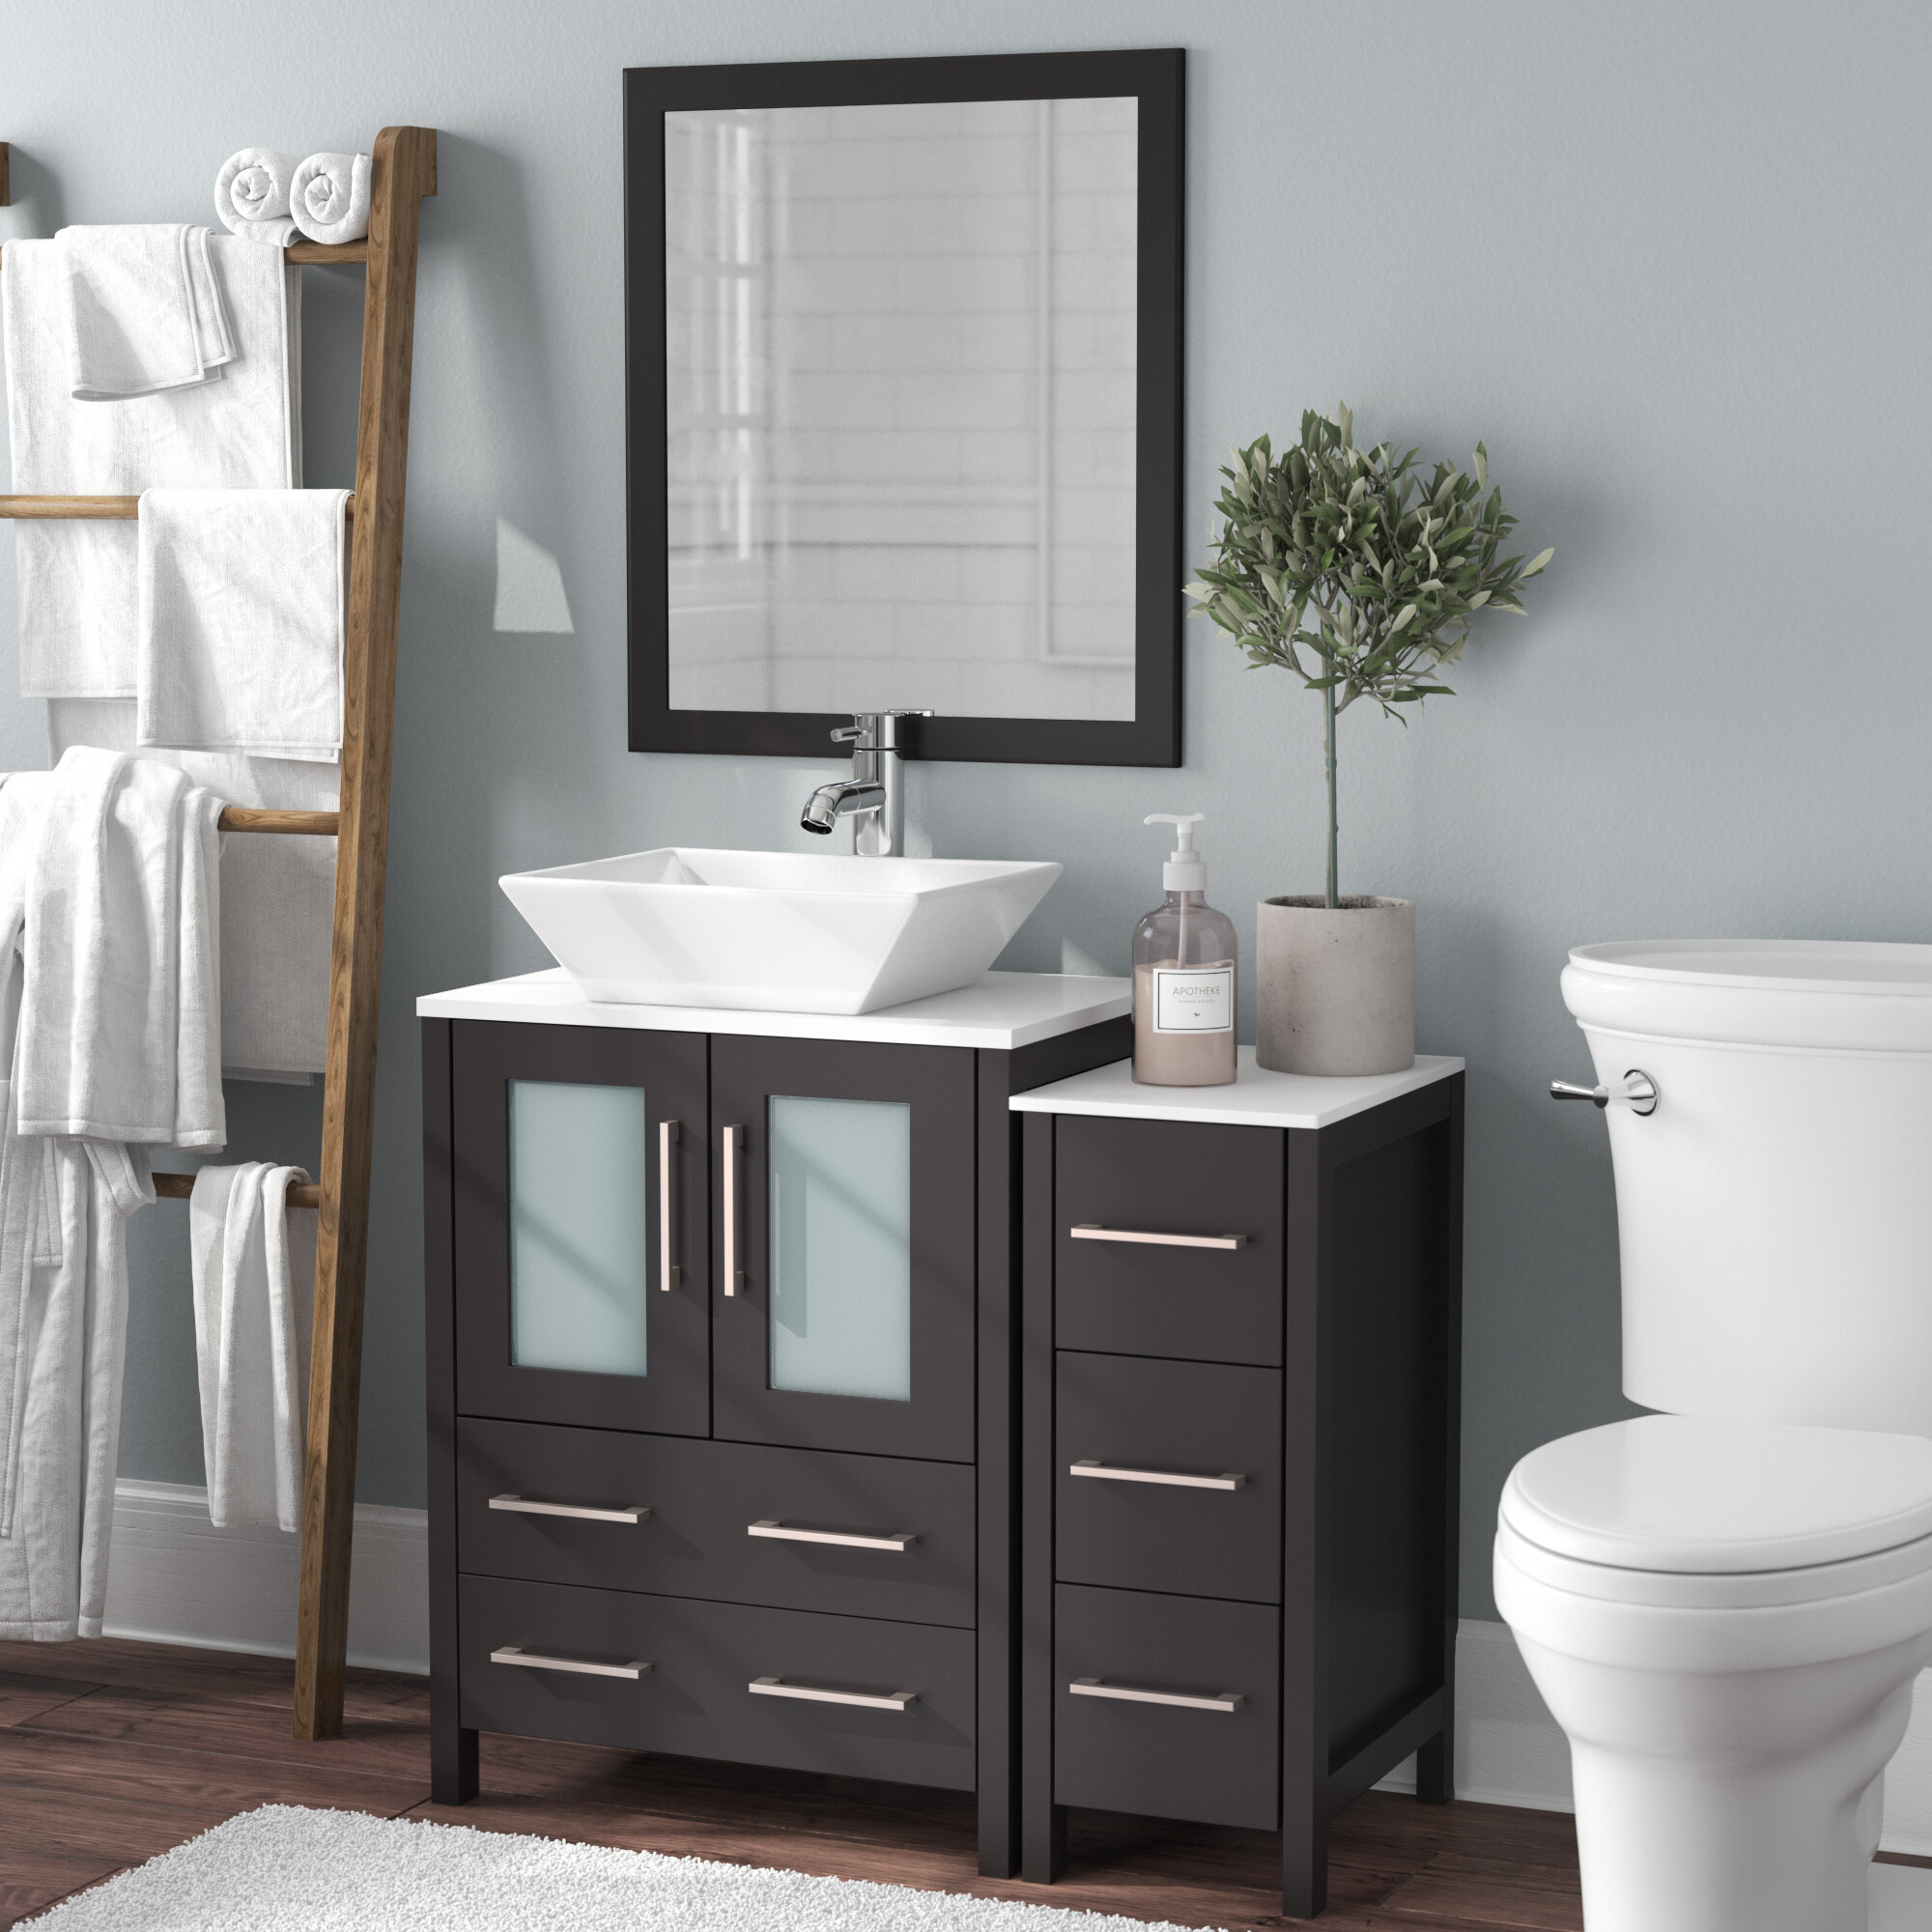 Peachy Megaira 36 Single Bathroom Vanity Set With Mirror Download Free Architecture Designs Scobabritishbridgeorg